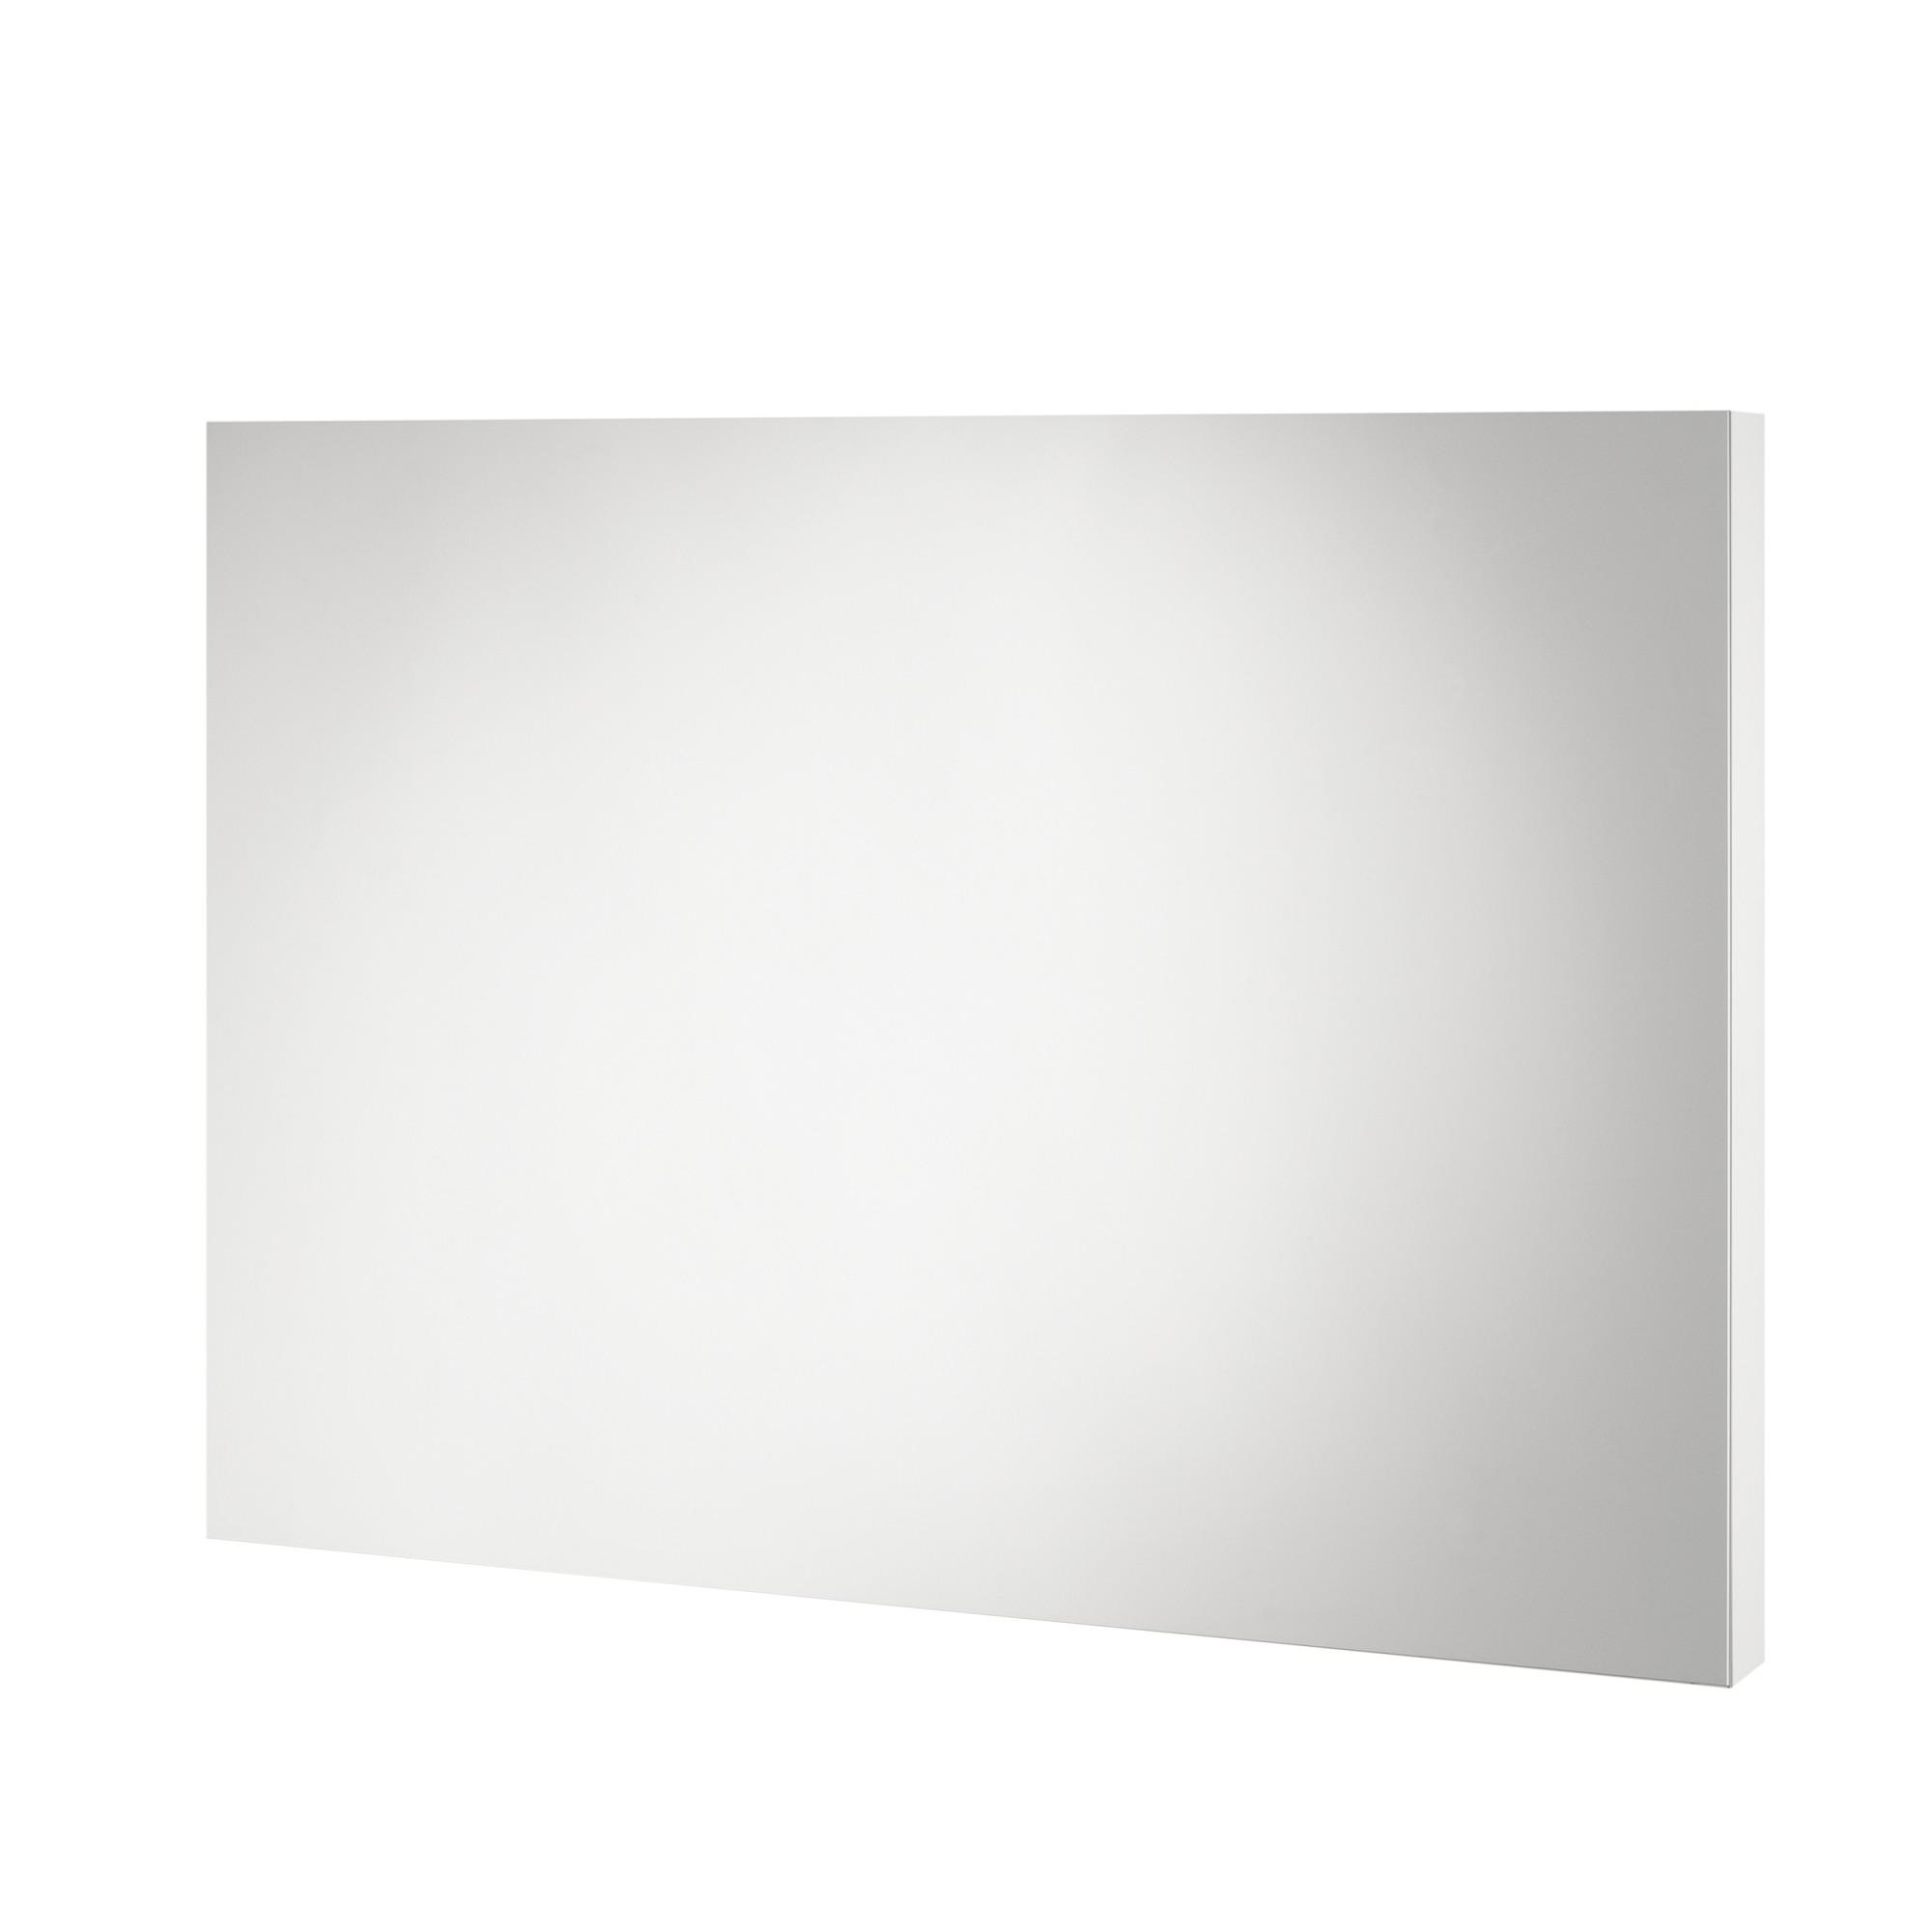 Tiger Items spiegelpaneel 70 x 50 cm, wit hoogglans